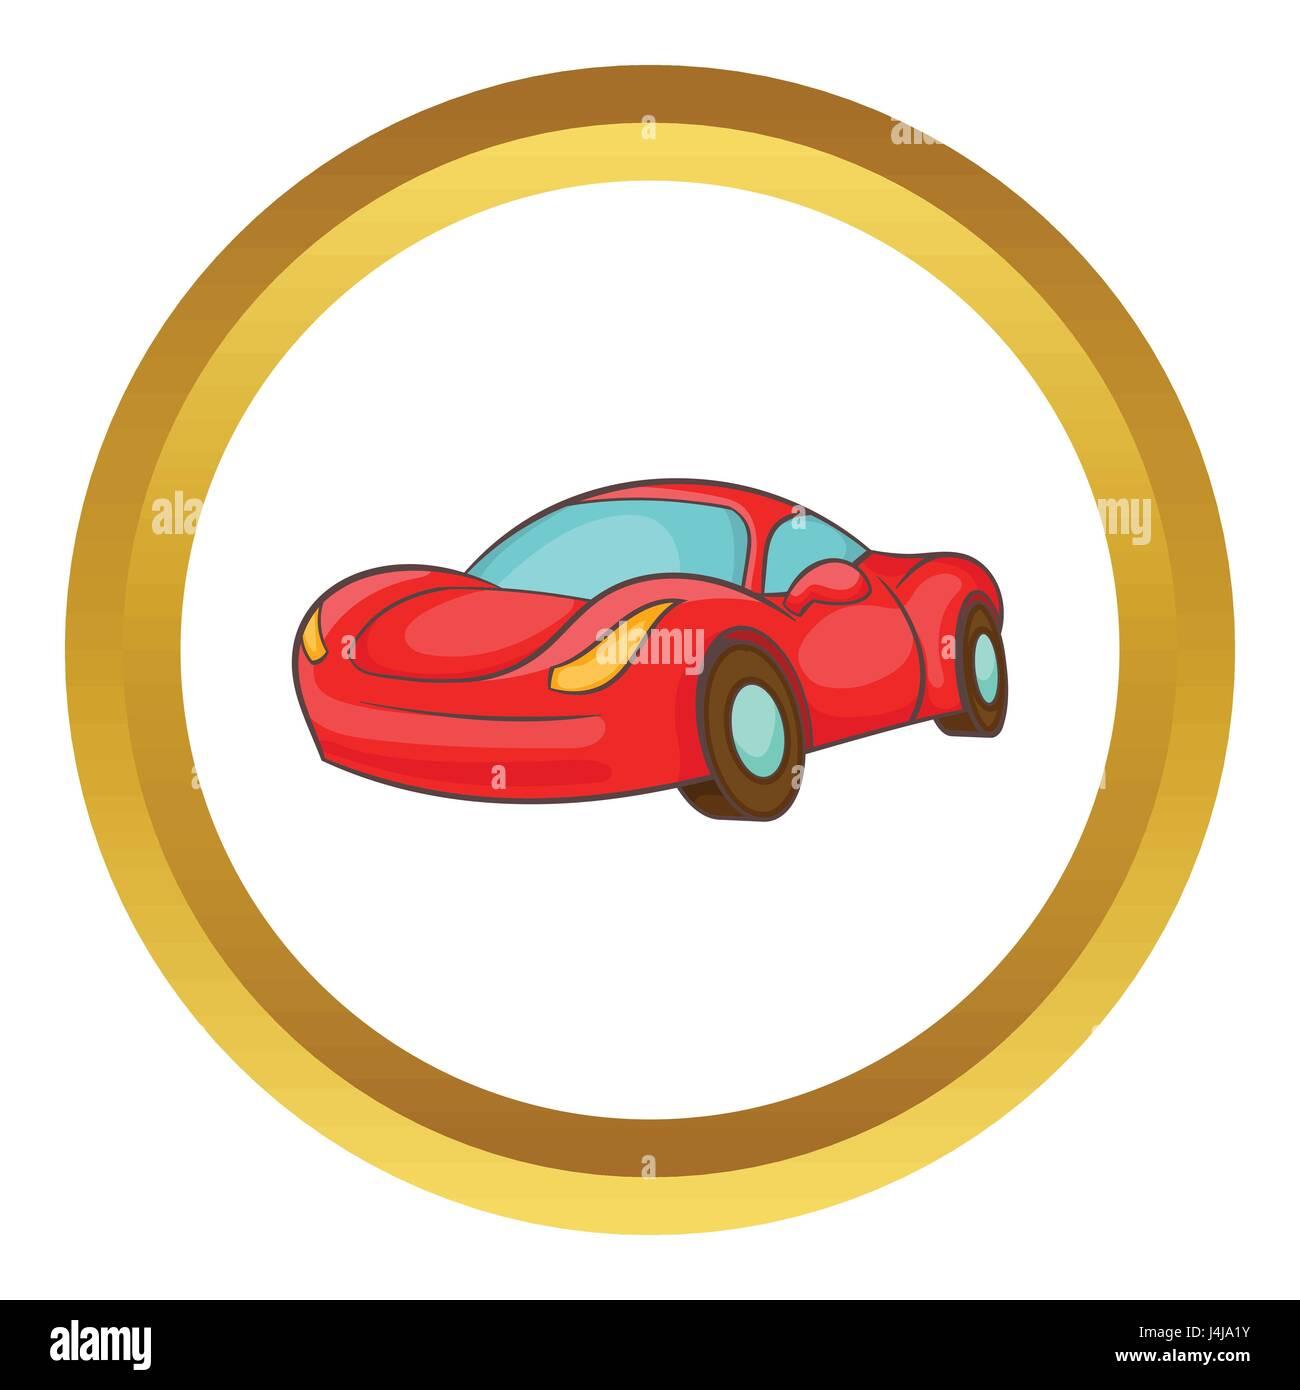 Small red italian car vector icon - Stock Image